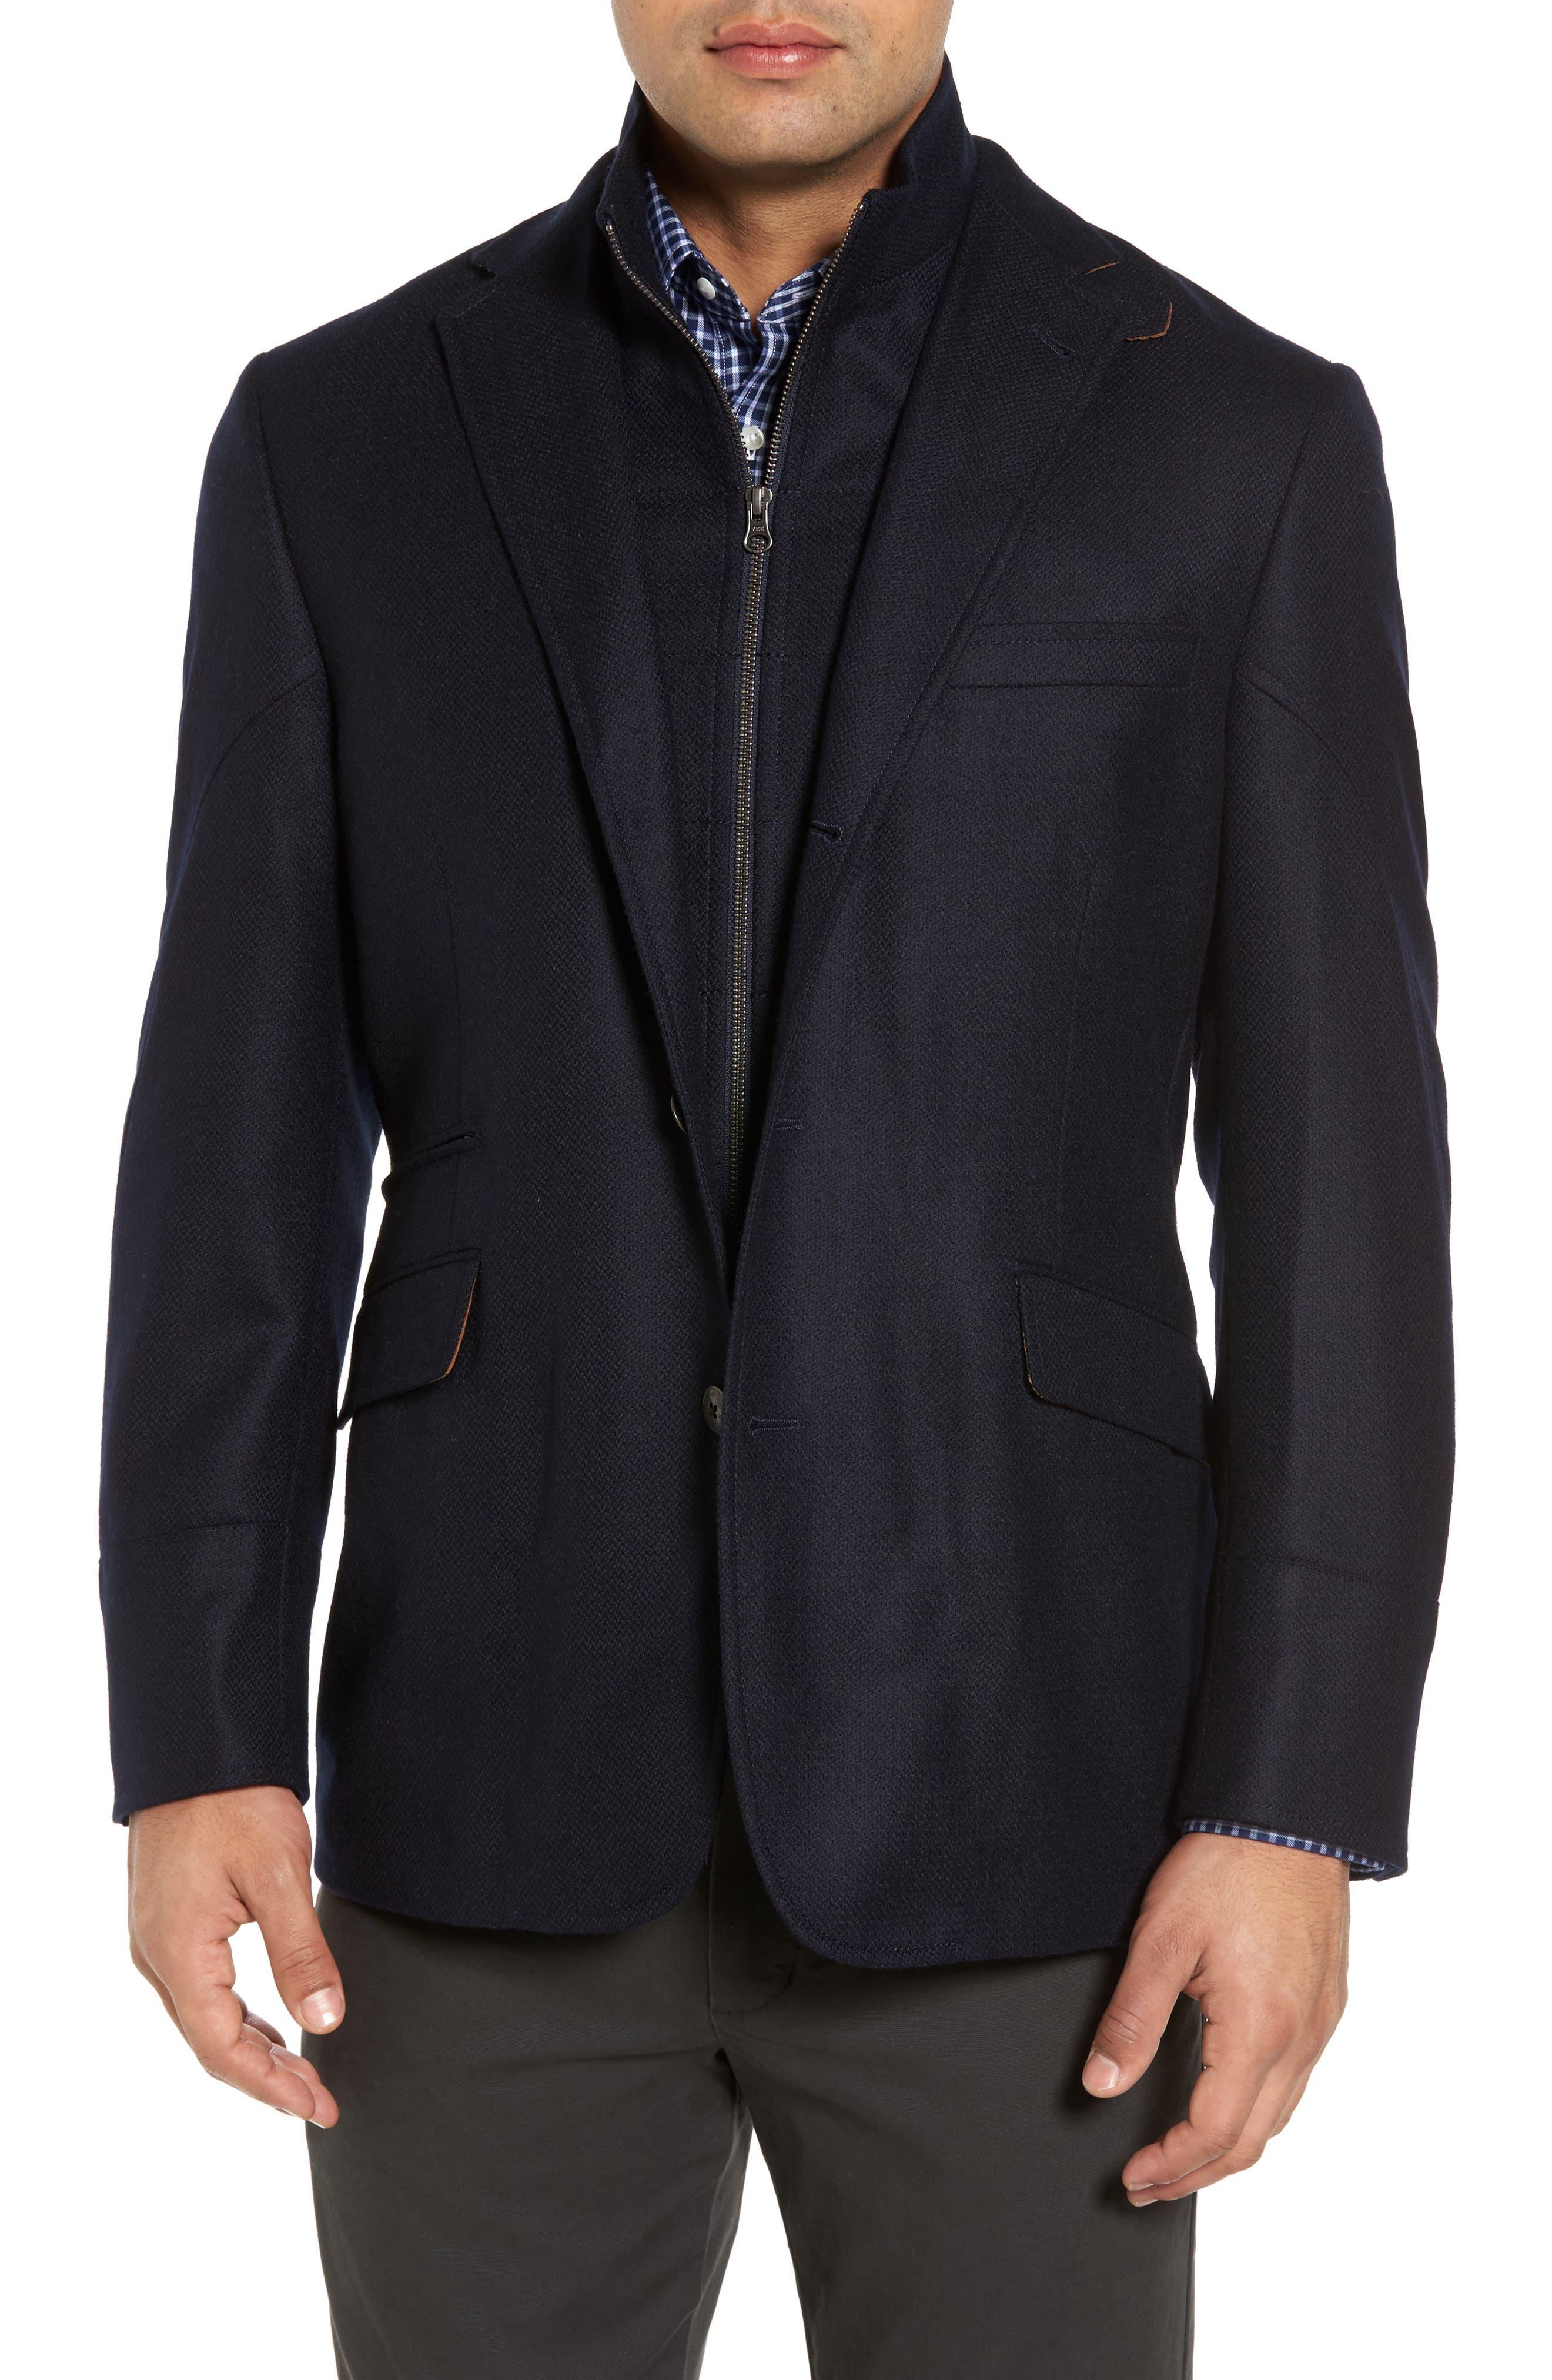 Main Image - Kroon Ritchie Aim Hybrid Classic Fit Wool & Cashmere Sport Coat